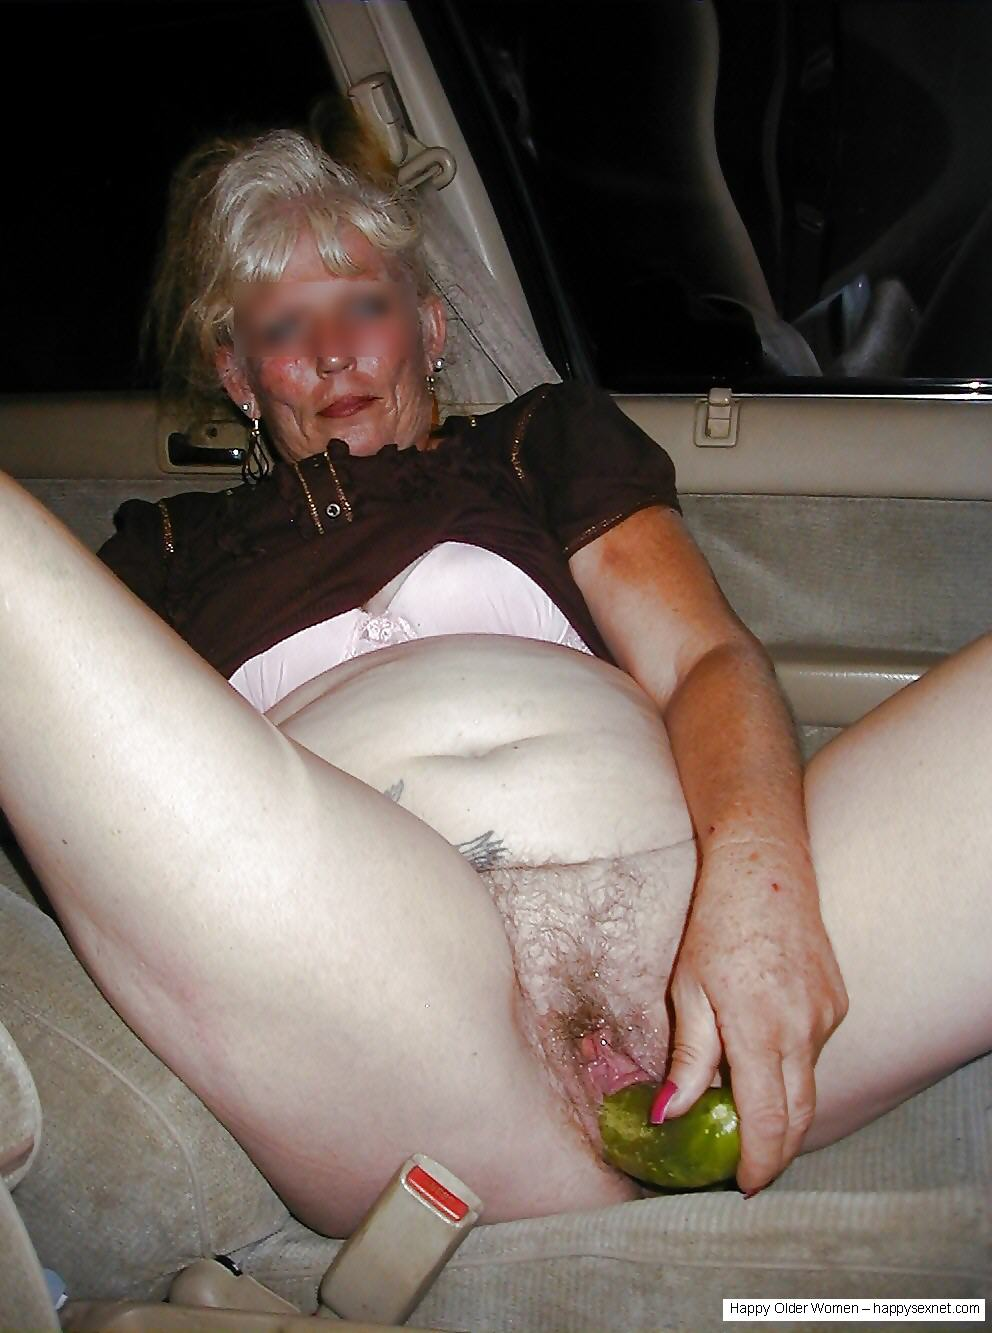 Girls gone wild in pantyhose